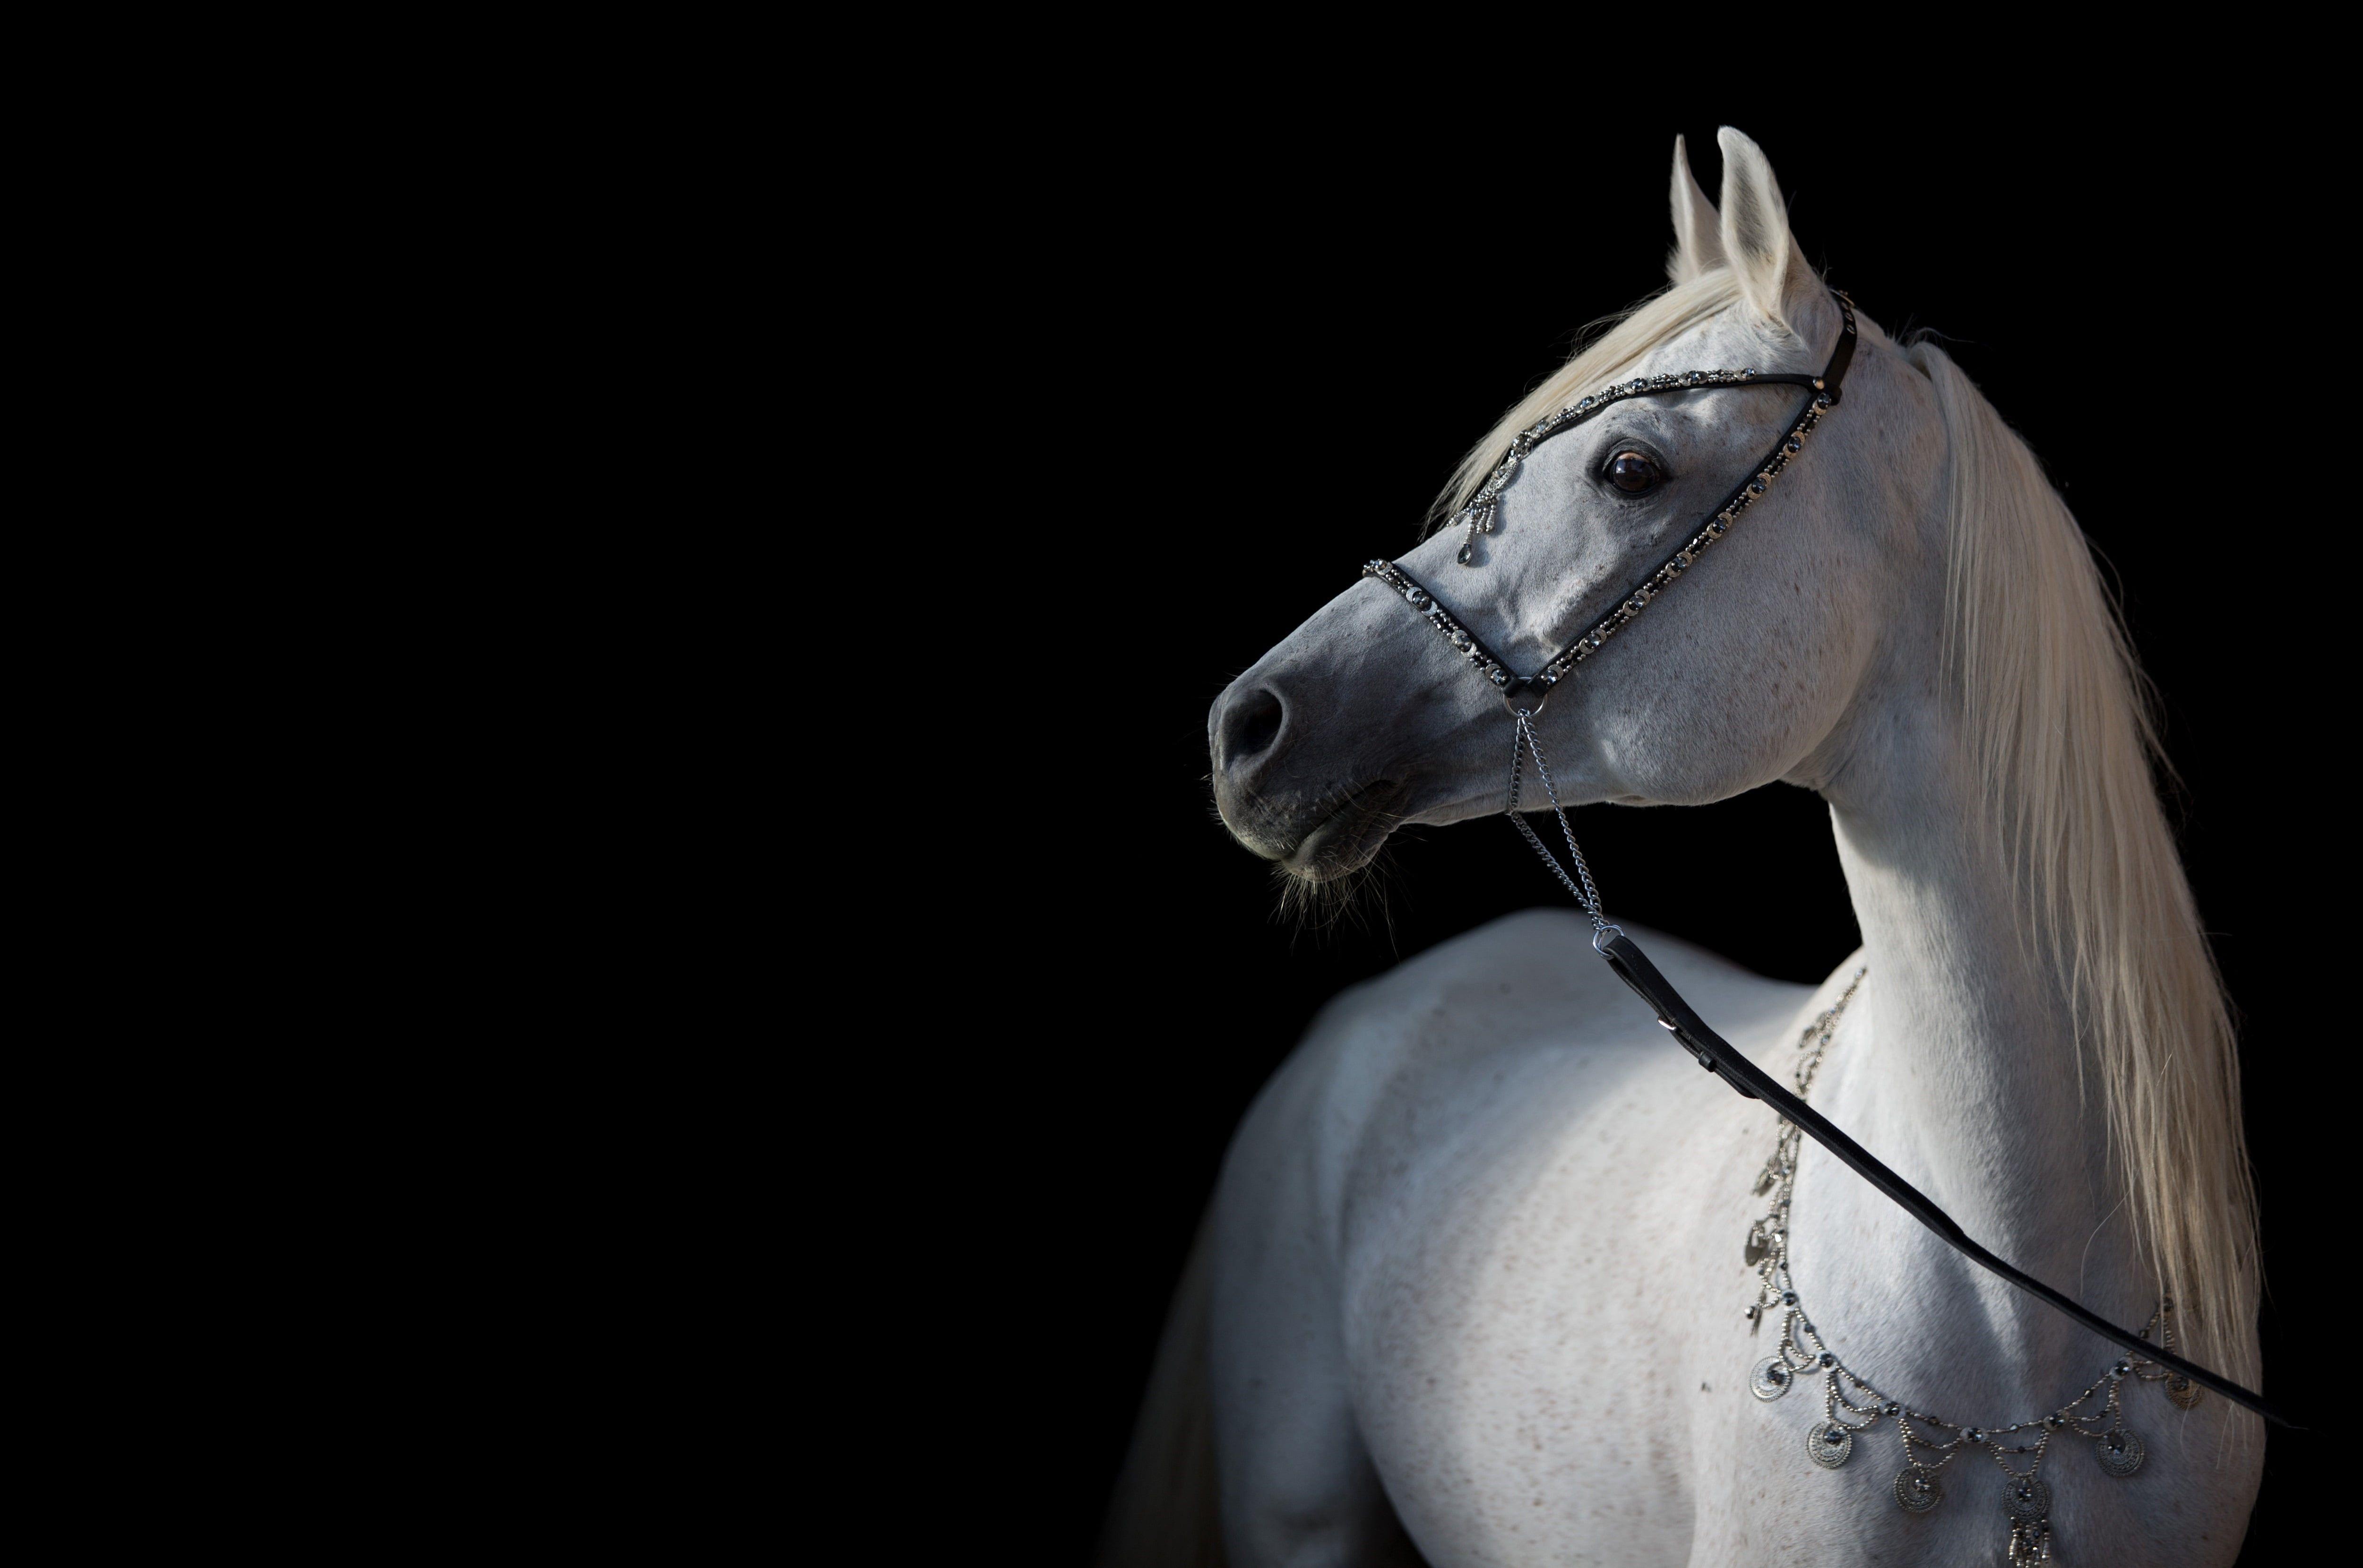 Light Horse Horse Contrast Grace The Dark Background Arab 4k Wallpaper Hdwallpaper Desktop In 2021 Horses Horse Wallpaper Dark Background